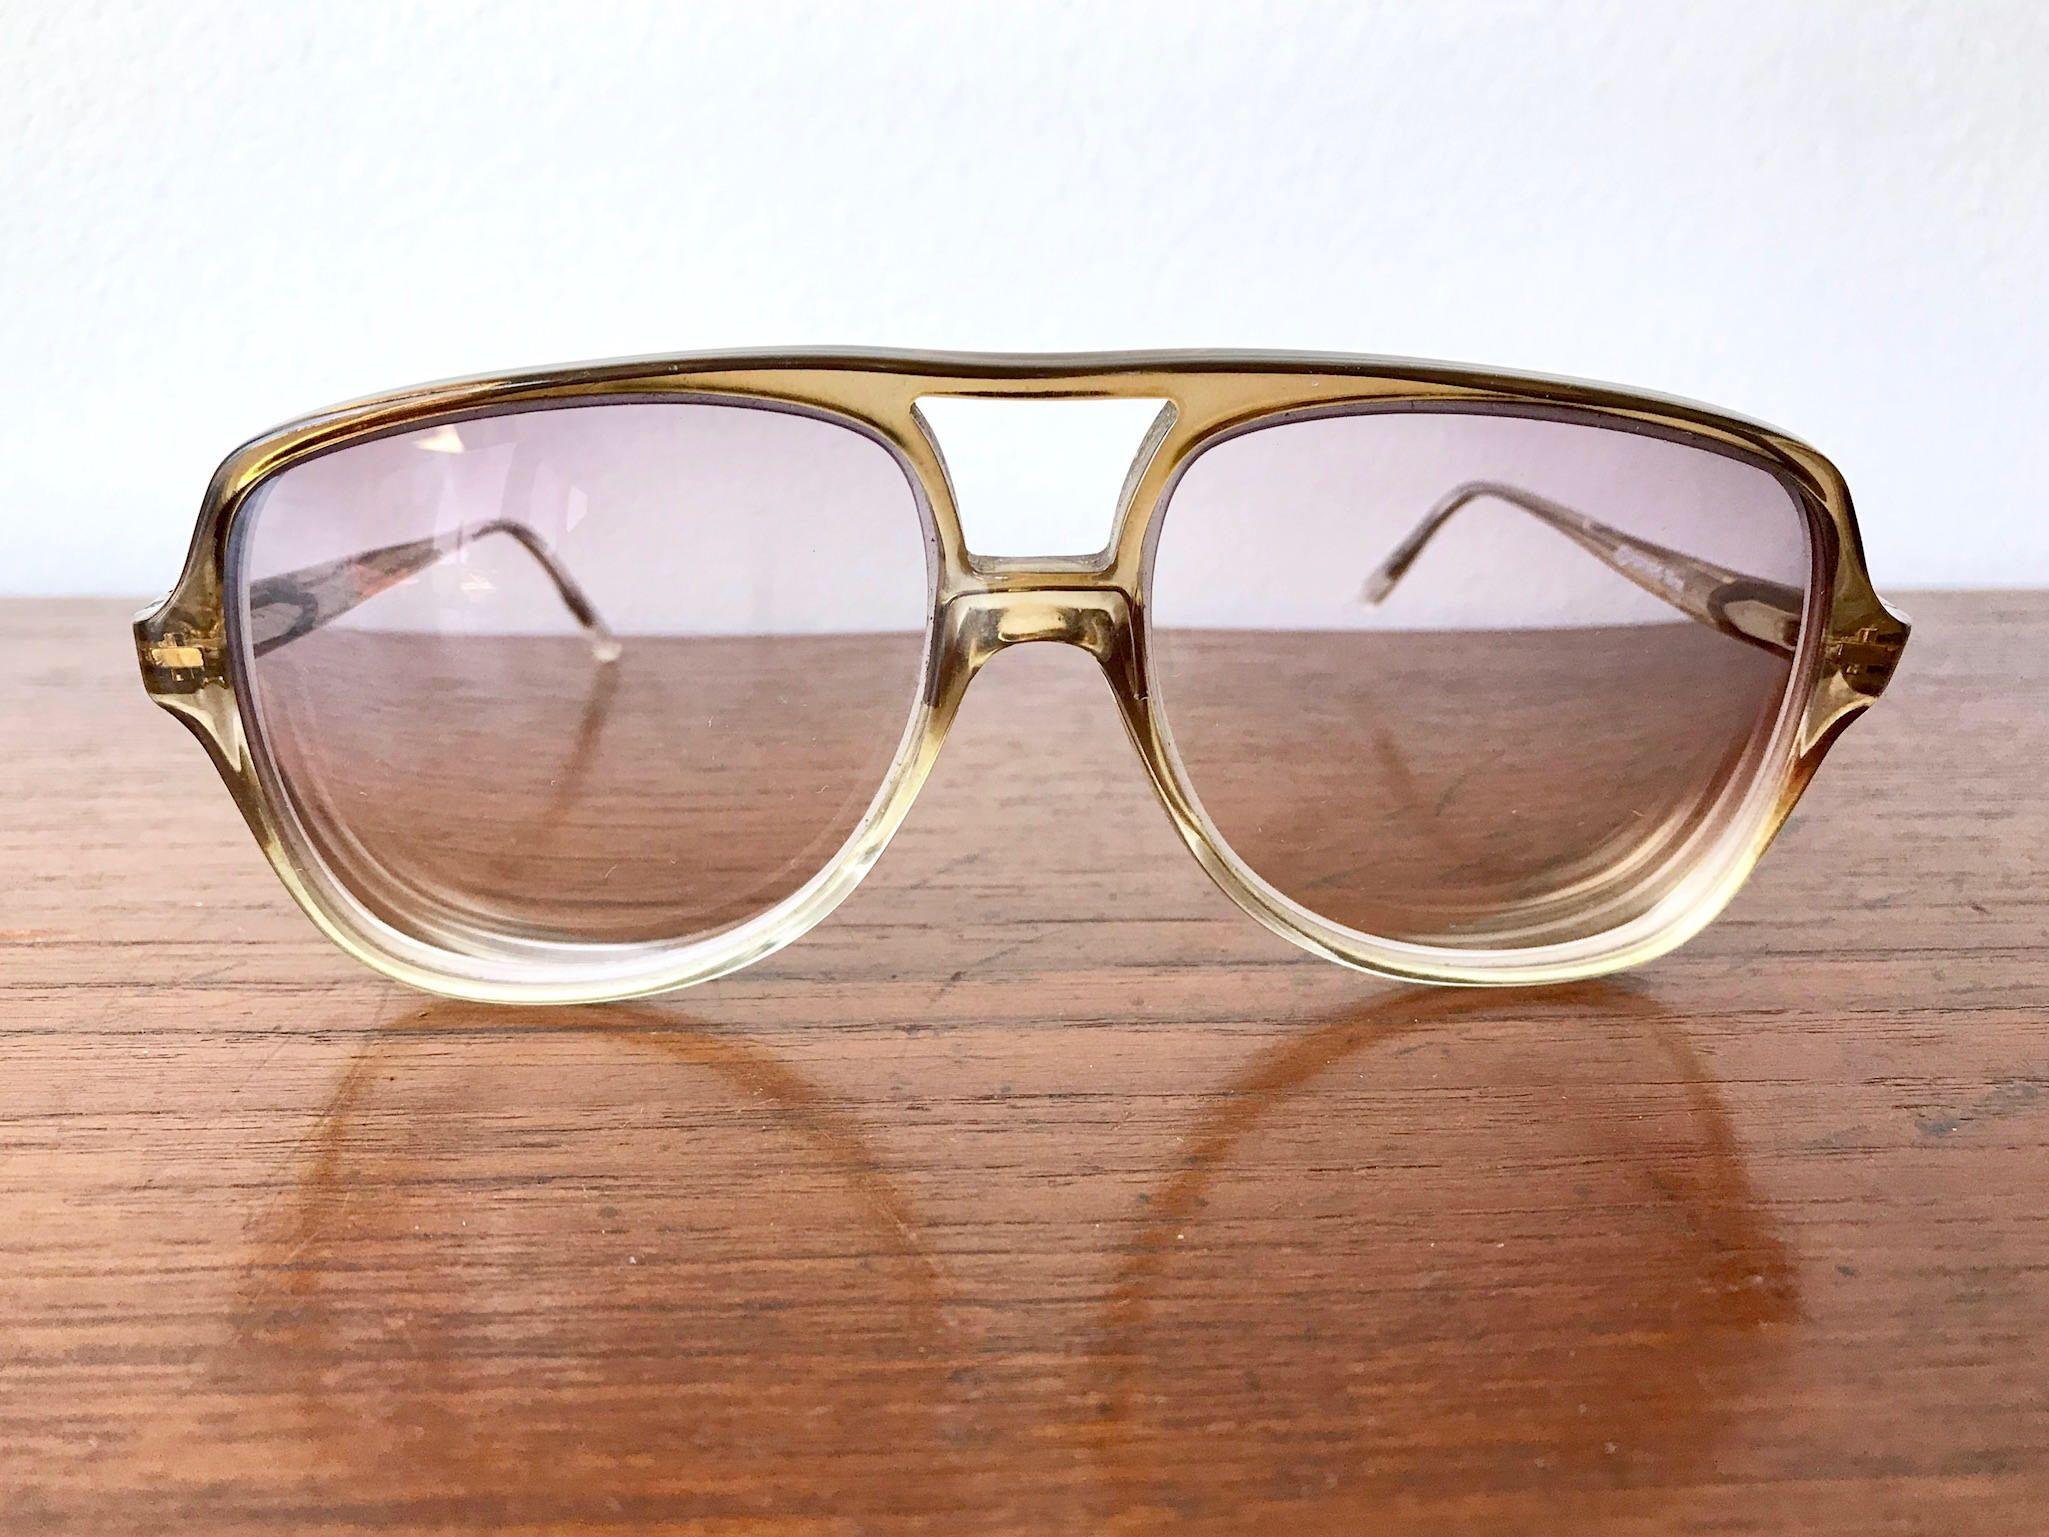 0ef43858af 70 s Two Tone Aviator Eyeglasses - Men s Oversized Prescription Eye Glass  Frames - Aviator Clear to Brown Prescription Eyewear Tiflex Frames